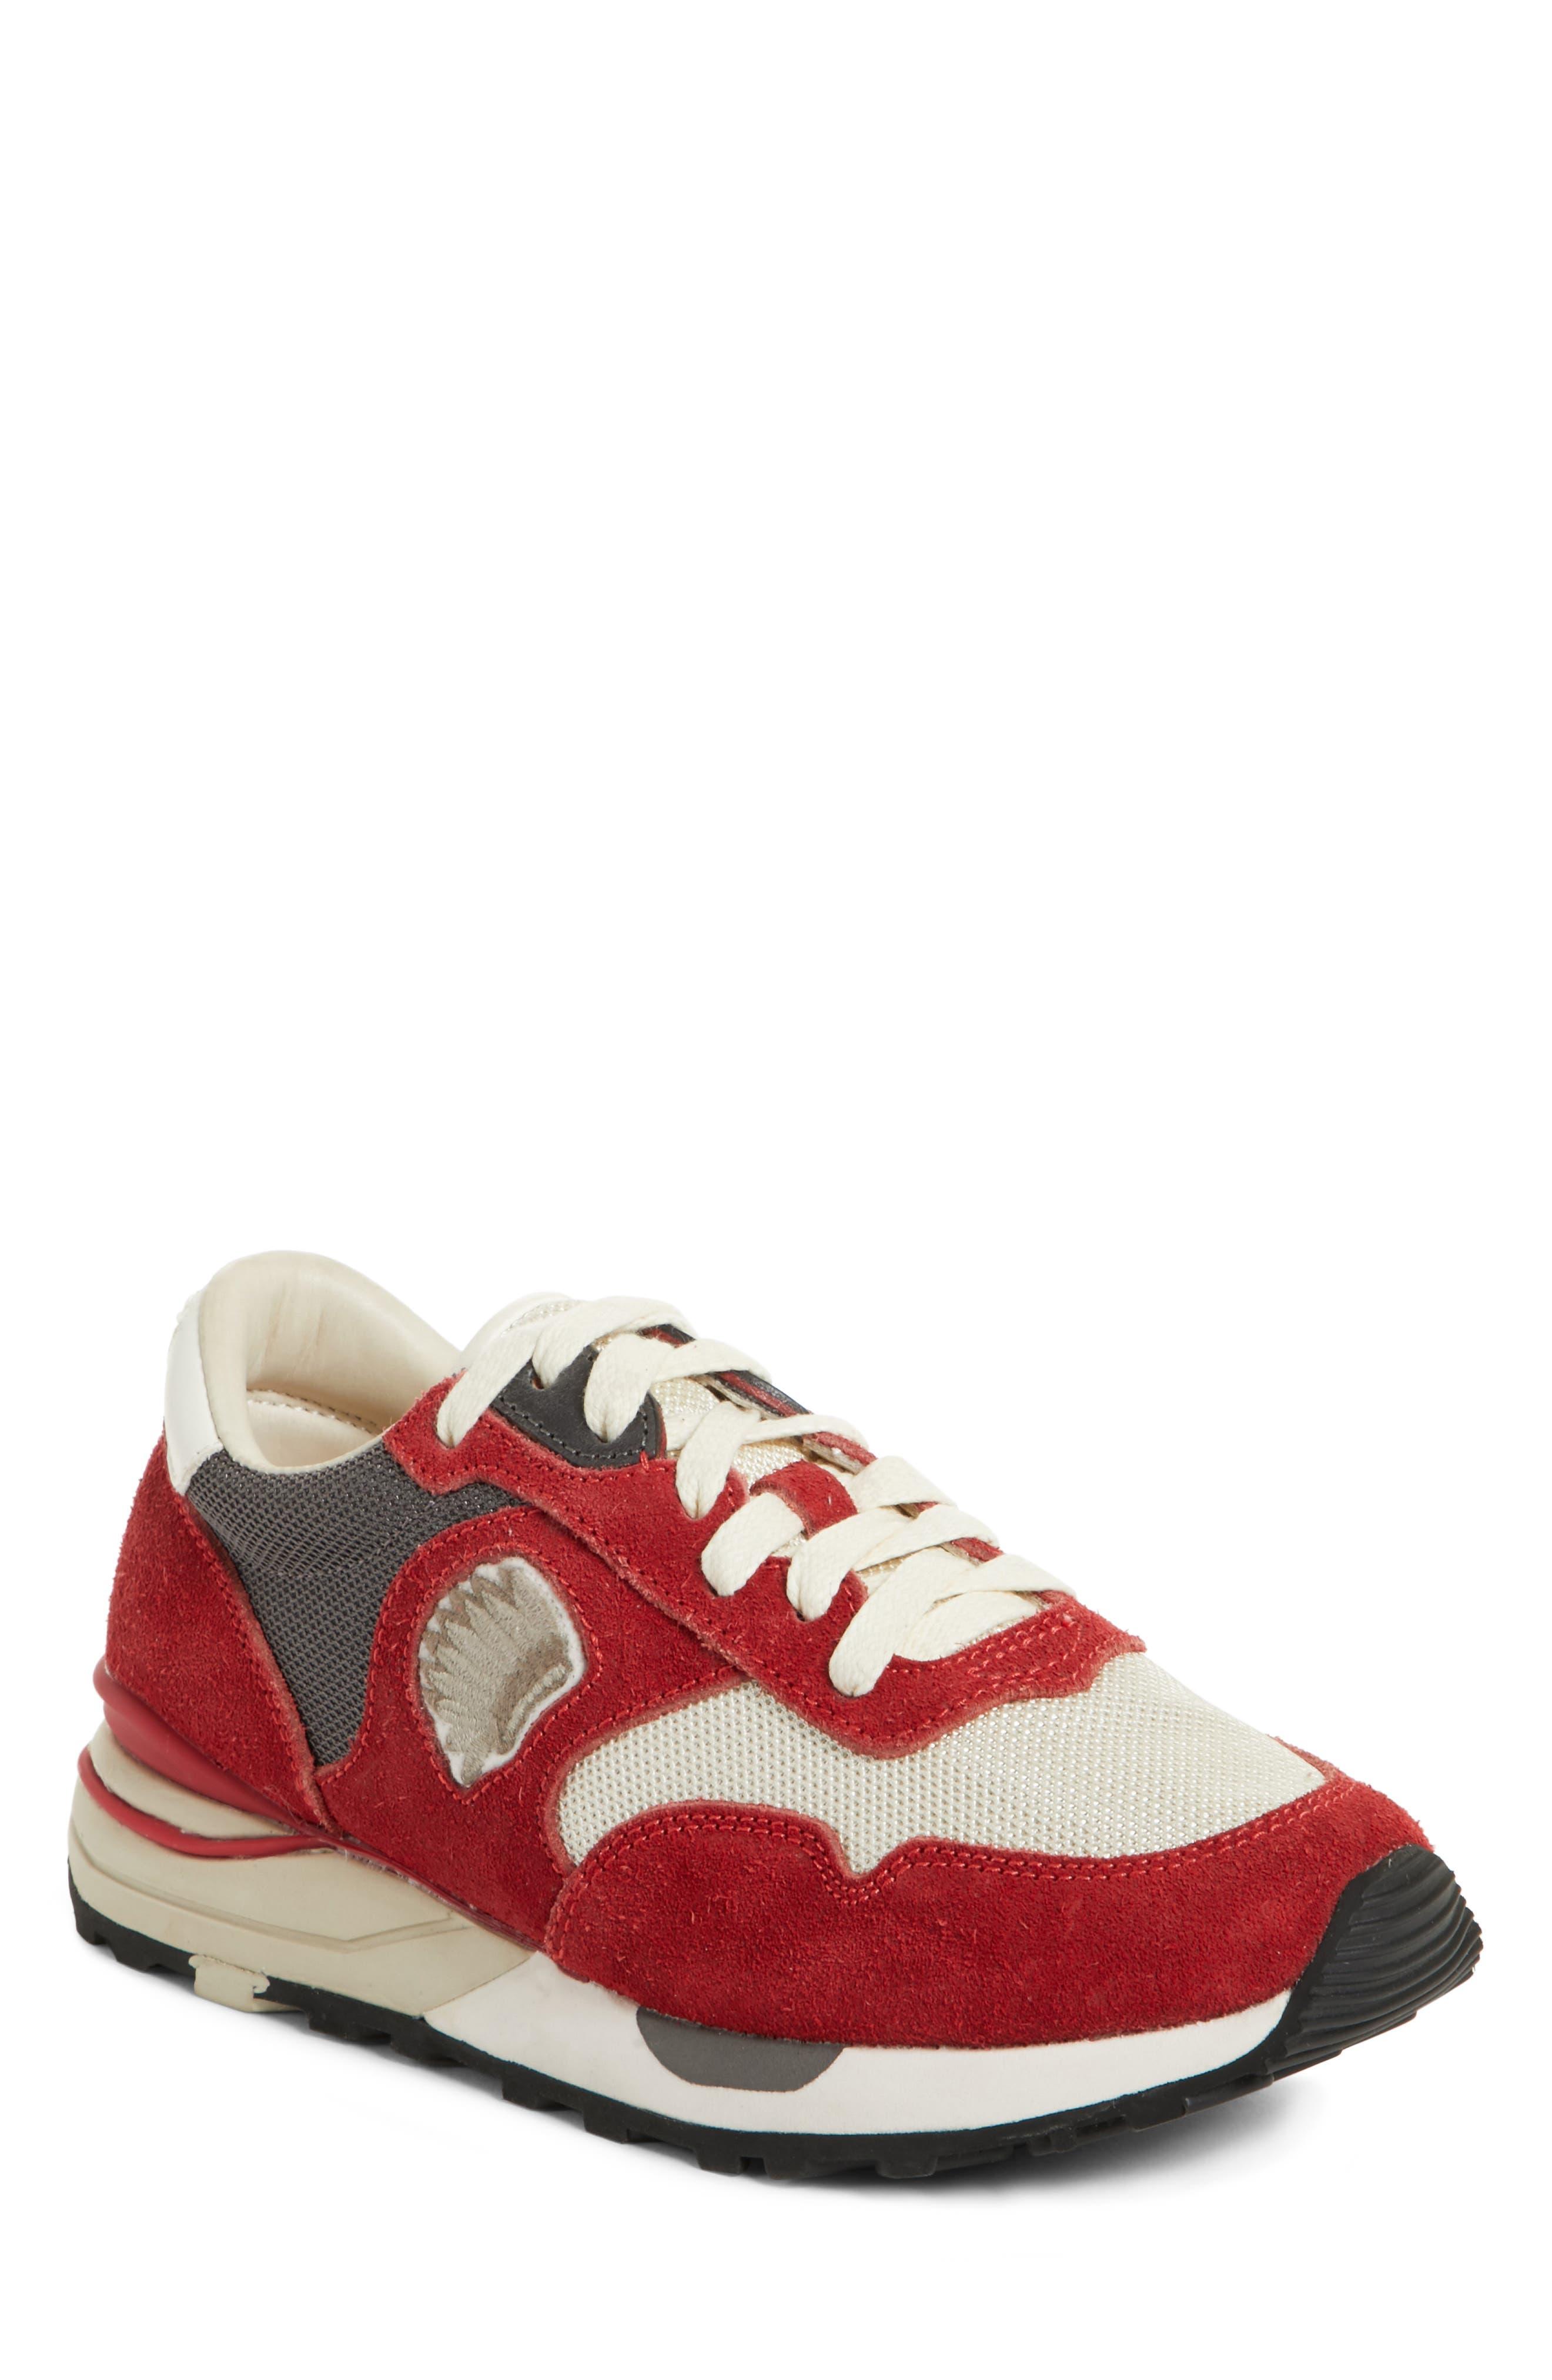 Main Image - WMV visvim Roland Jogger Sneaker (Women)